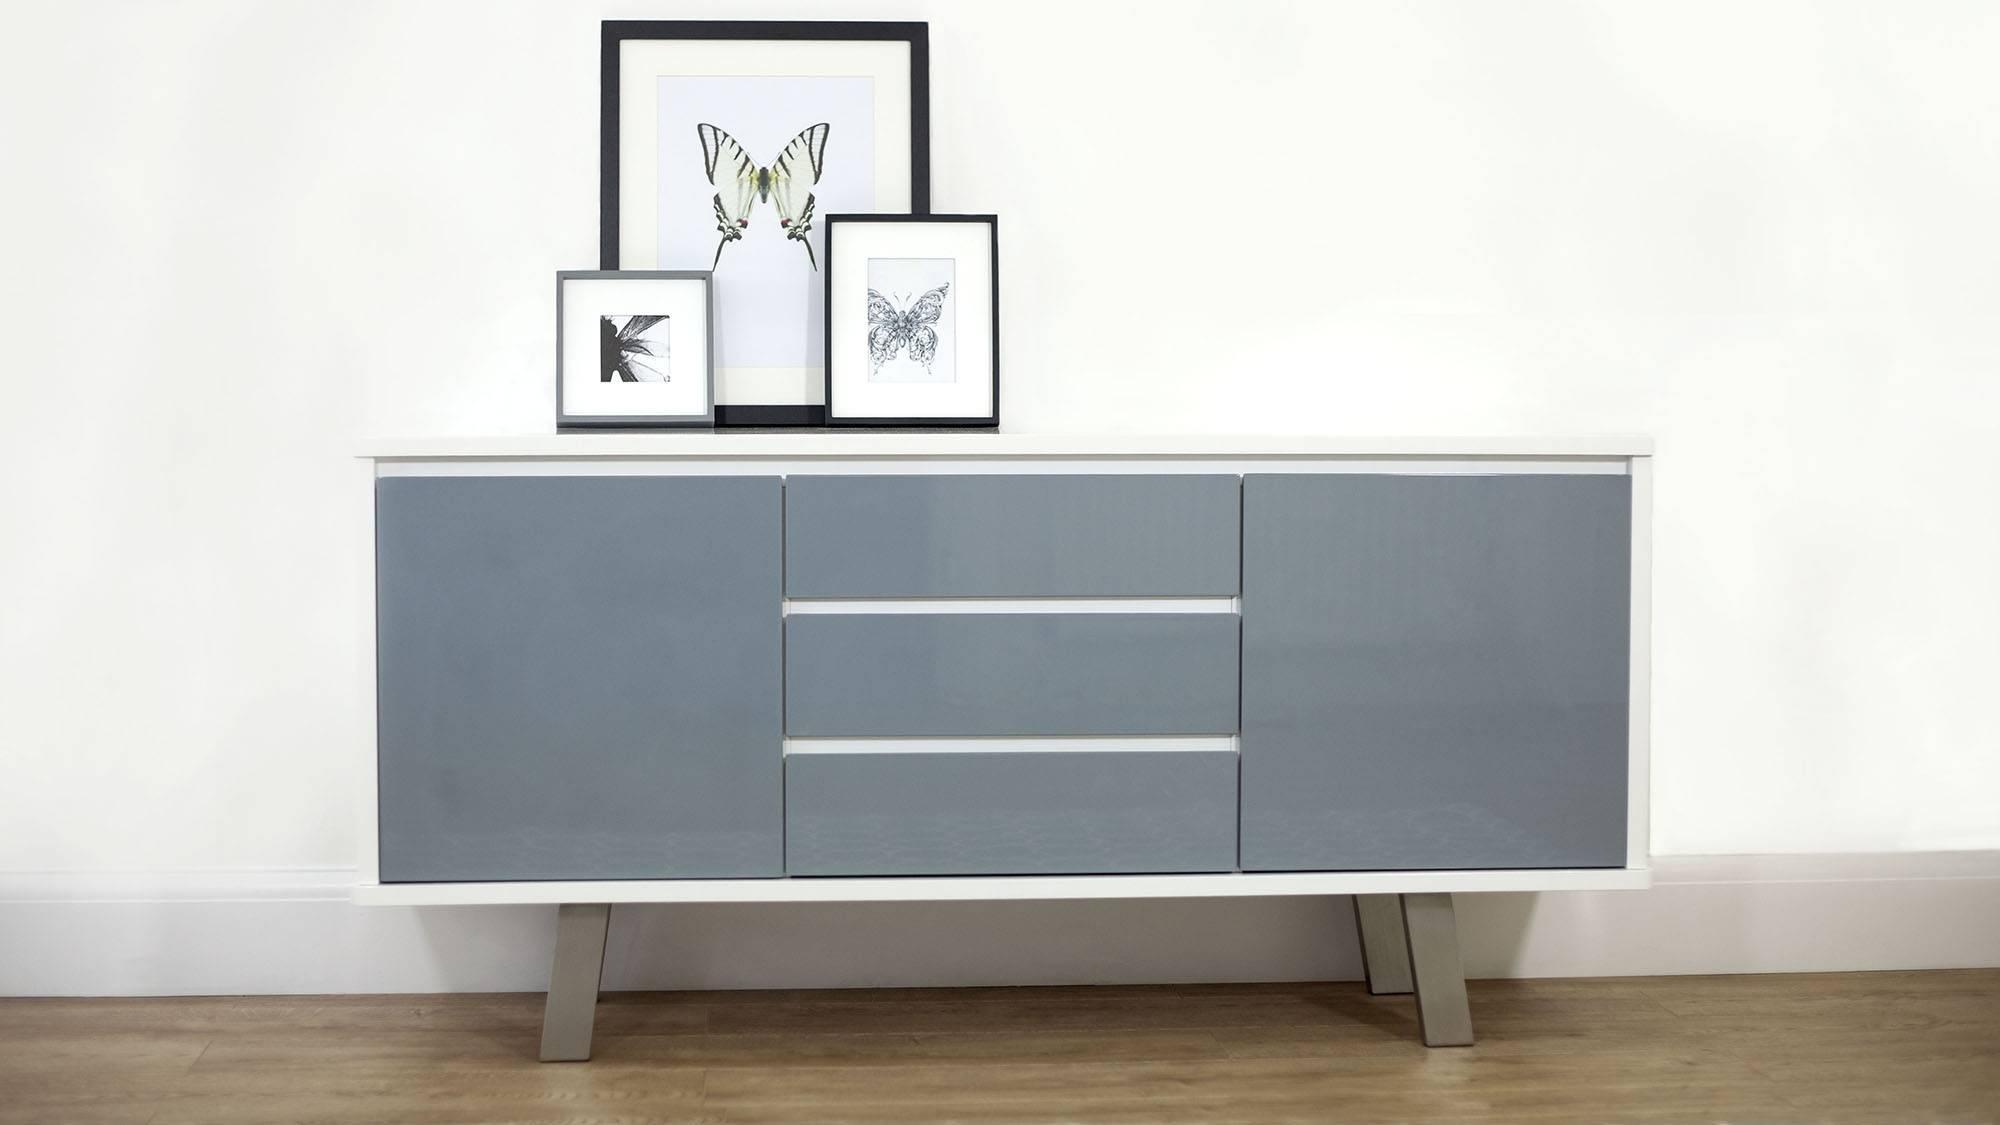 Impressive Contemporary Grey Oak Sideboard Design With Drawers And In Contemporary Sideboard Cabinet (View 18 of 20)